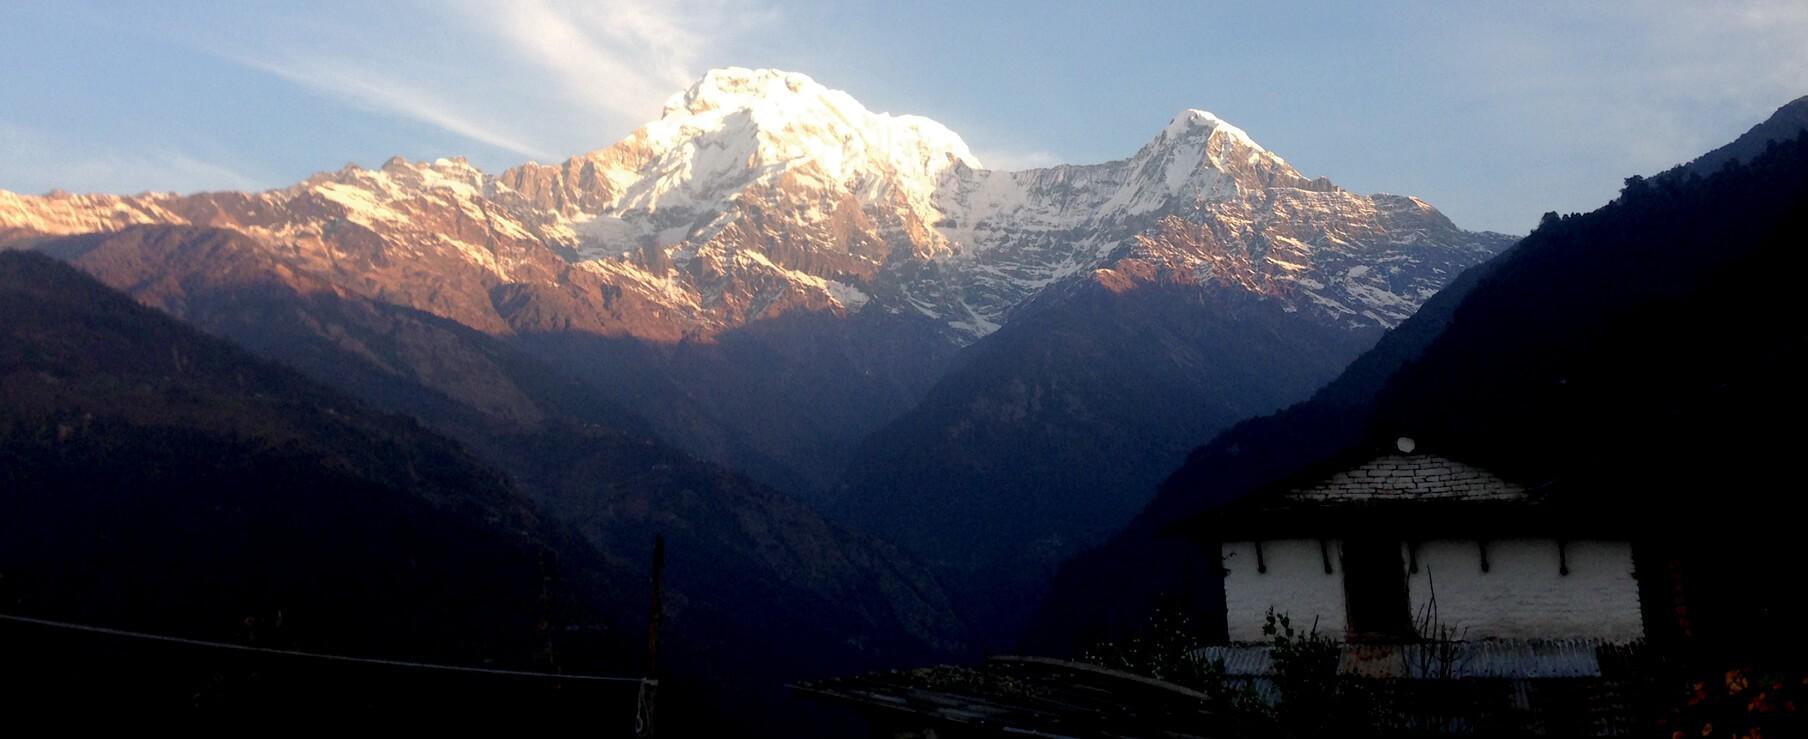 Everest and Annapurna Trek